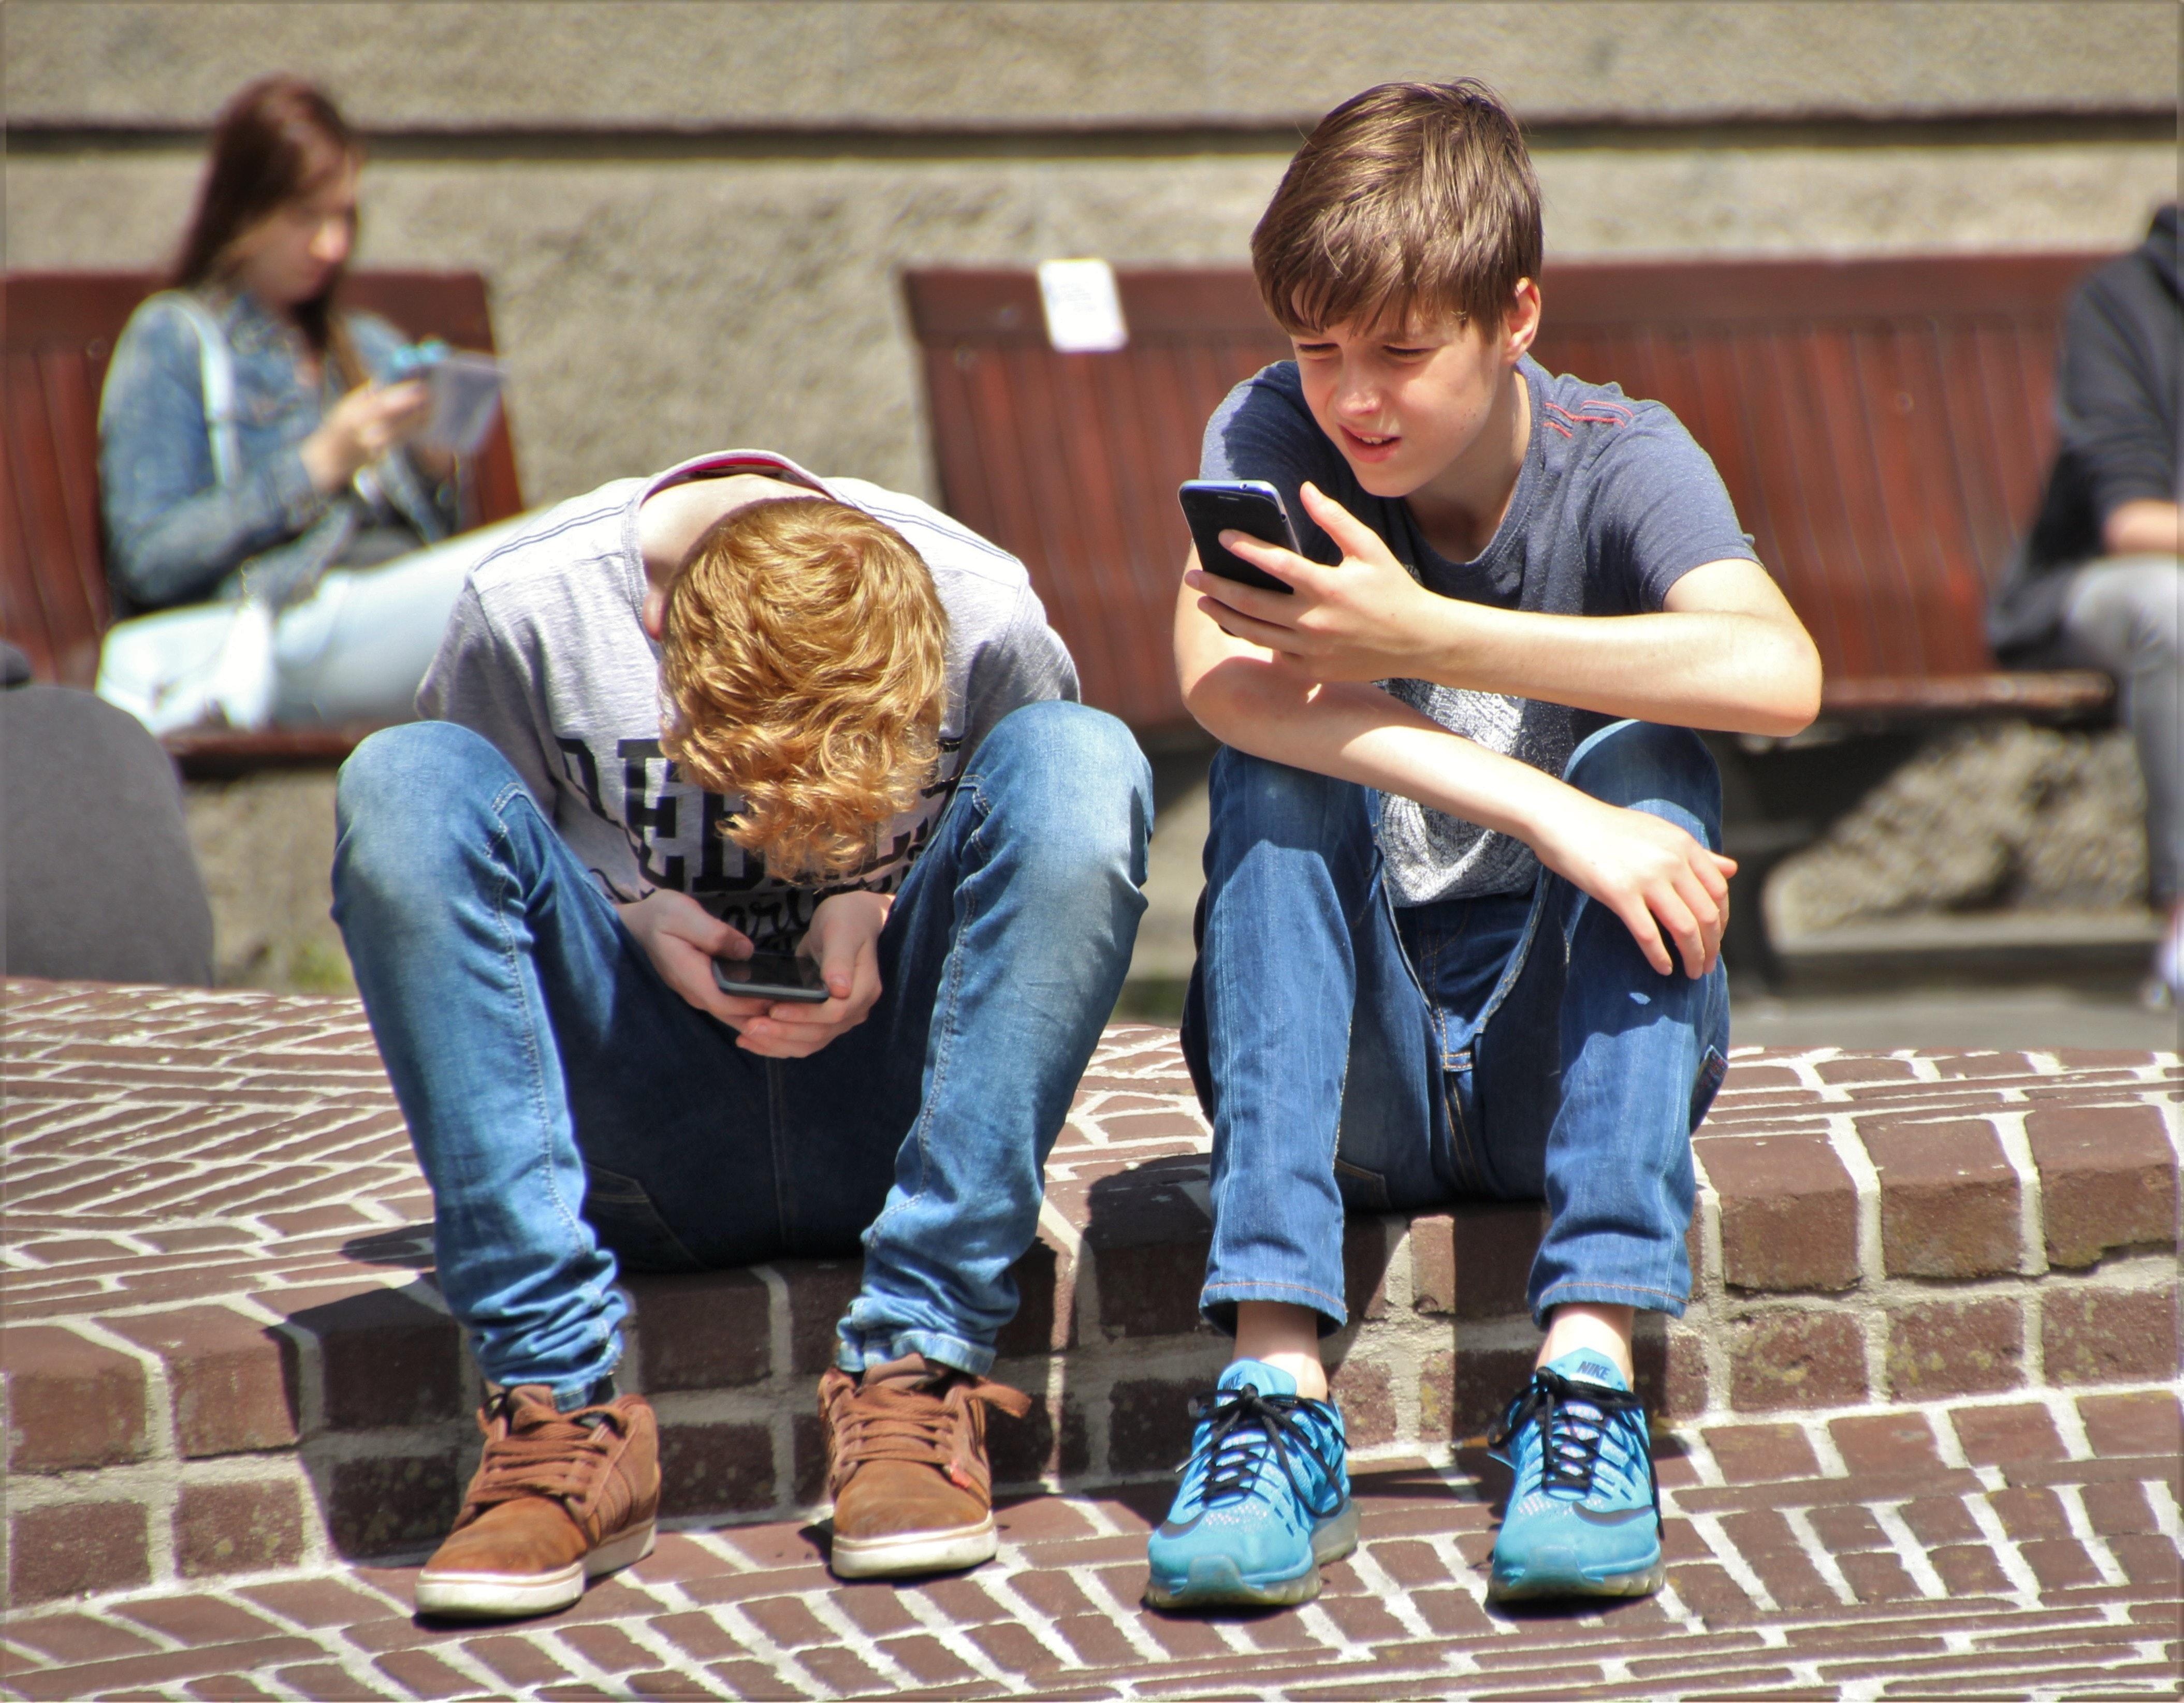 Móviles Para Jóvenes